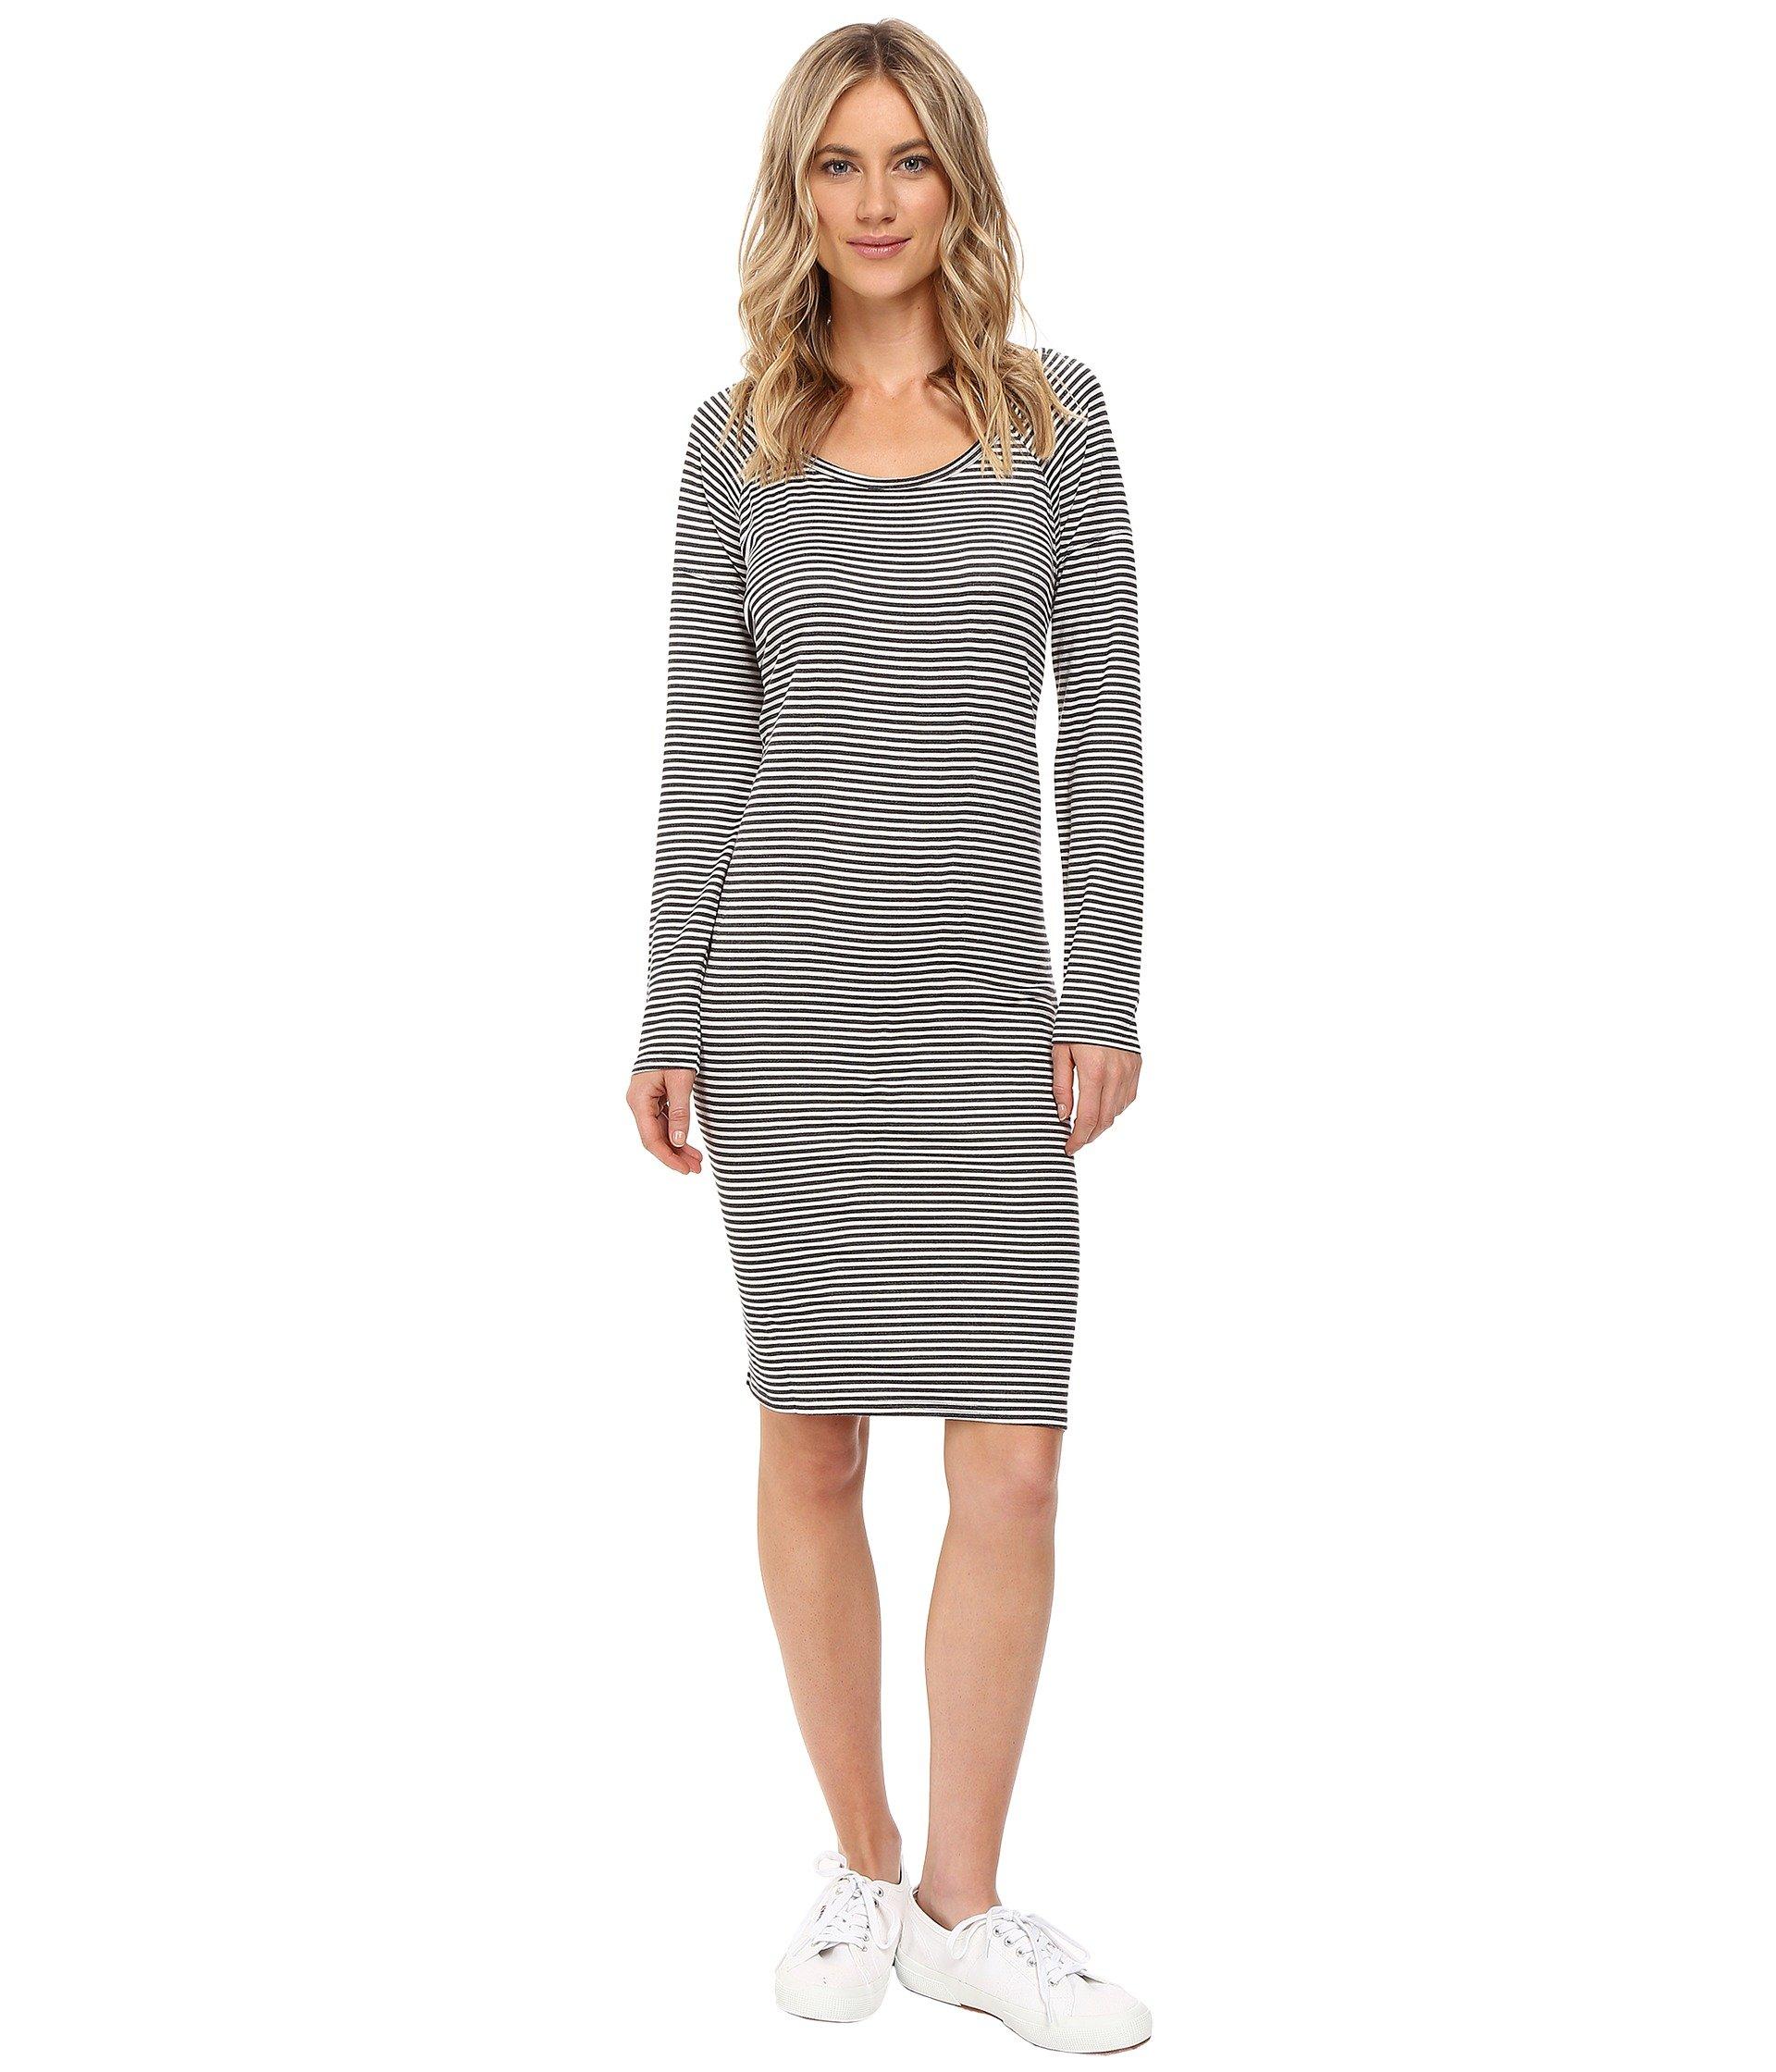 Riley Raglan Dress